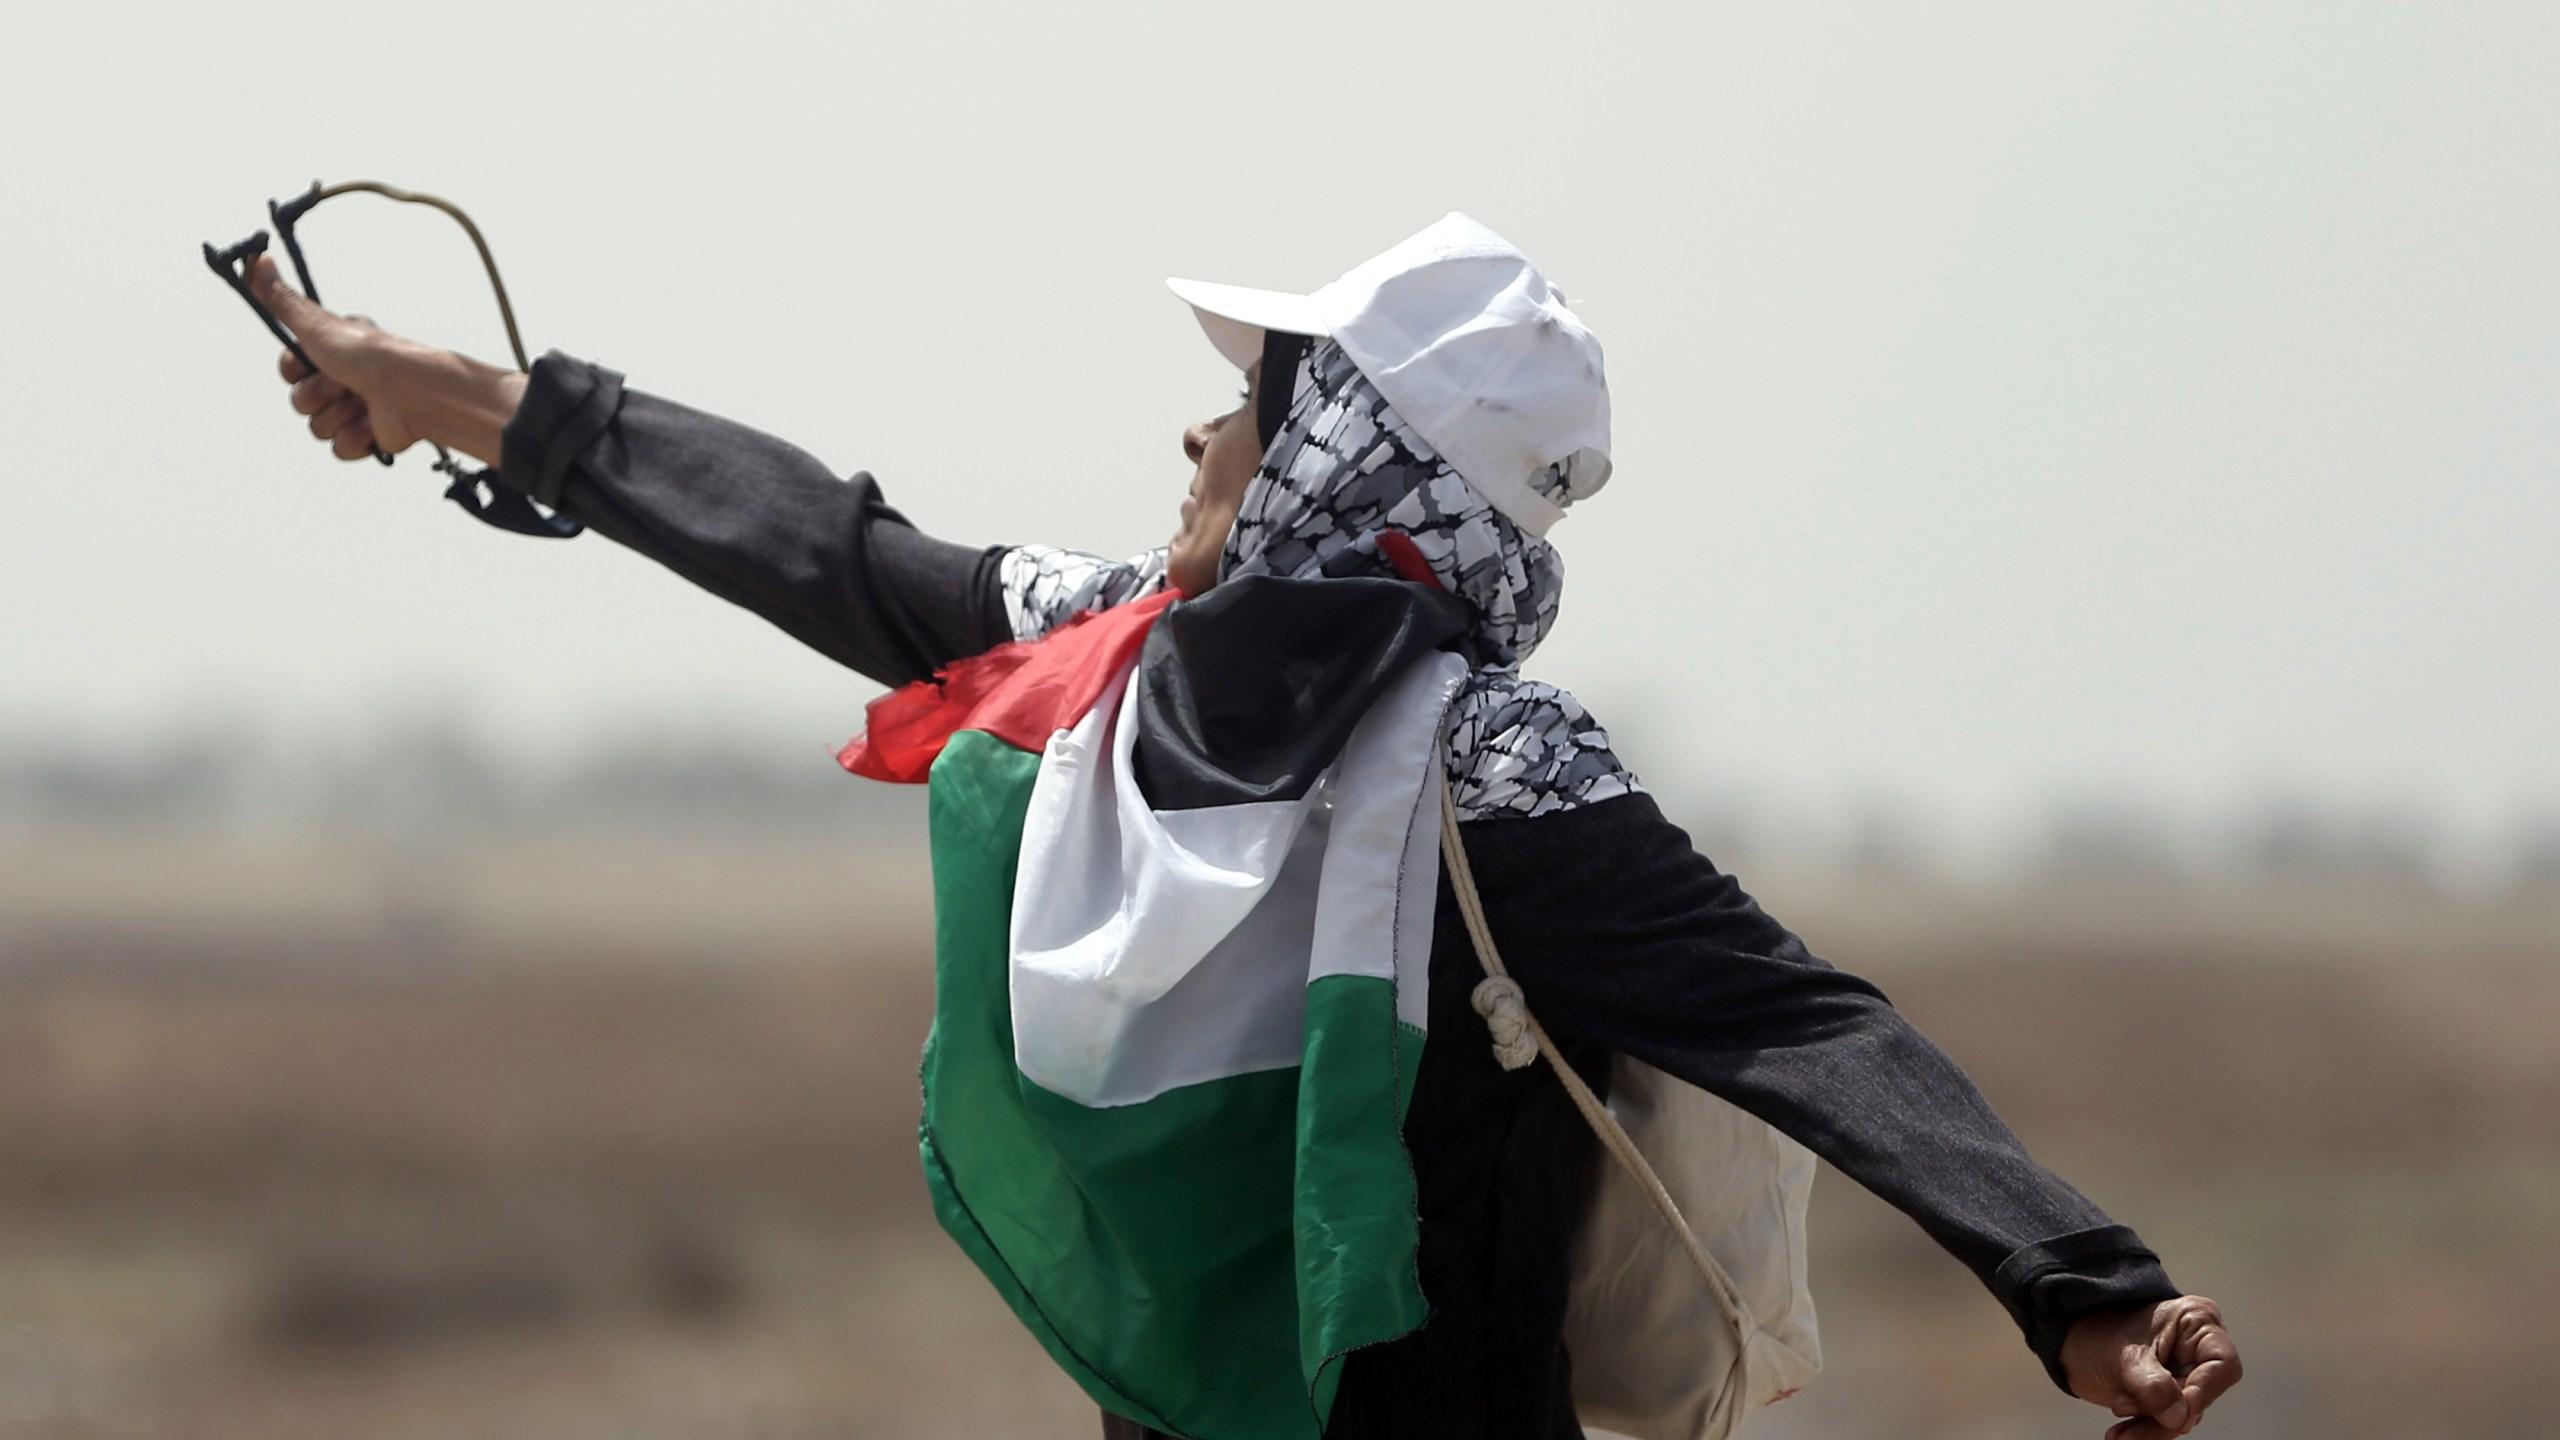 Palestinians Israel_1524229024840